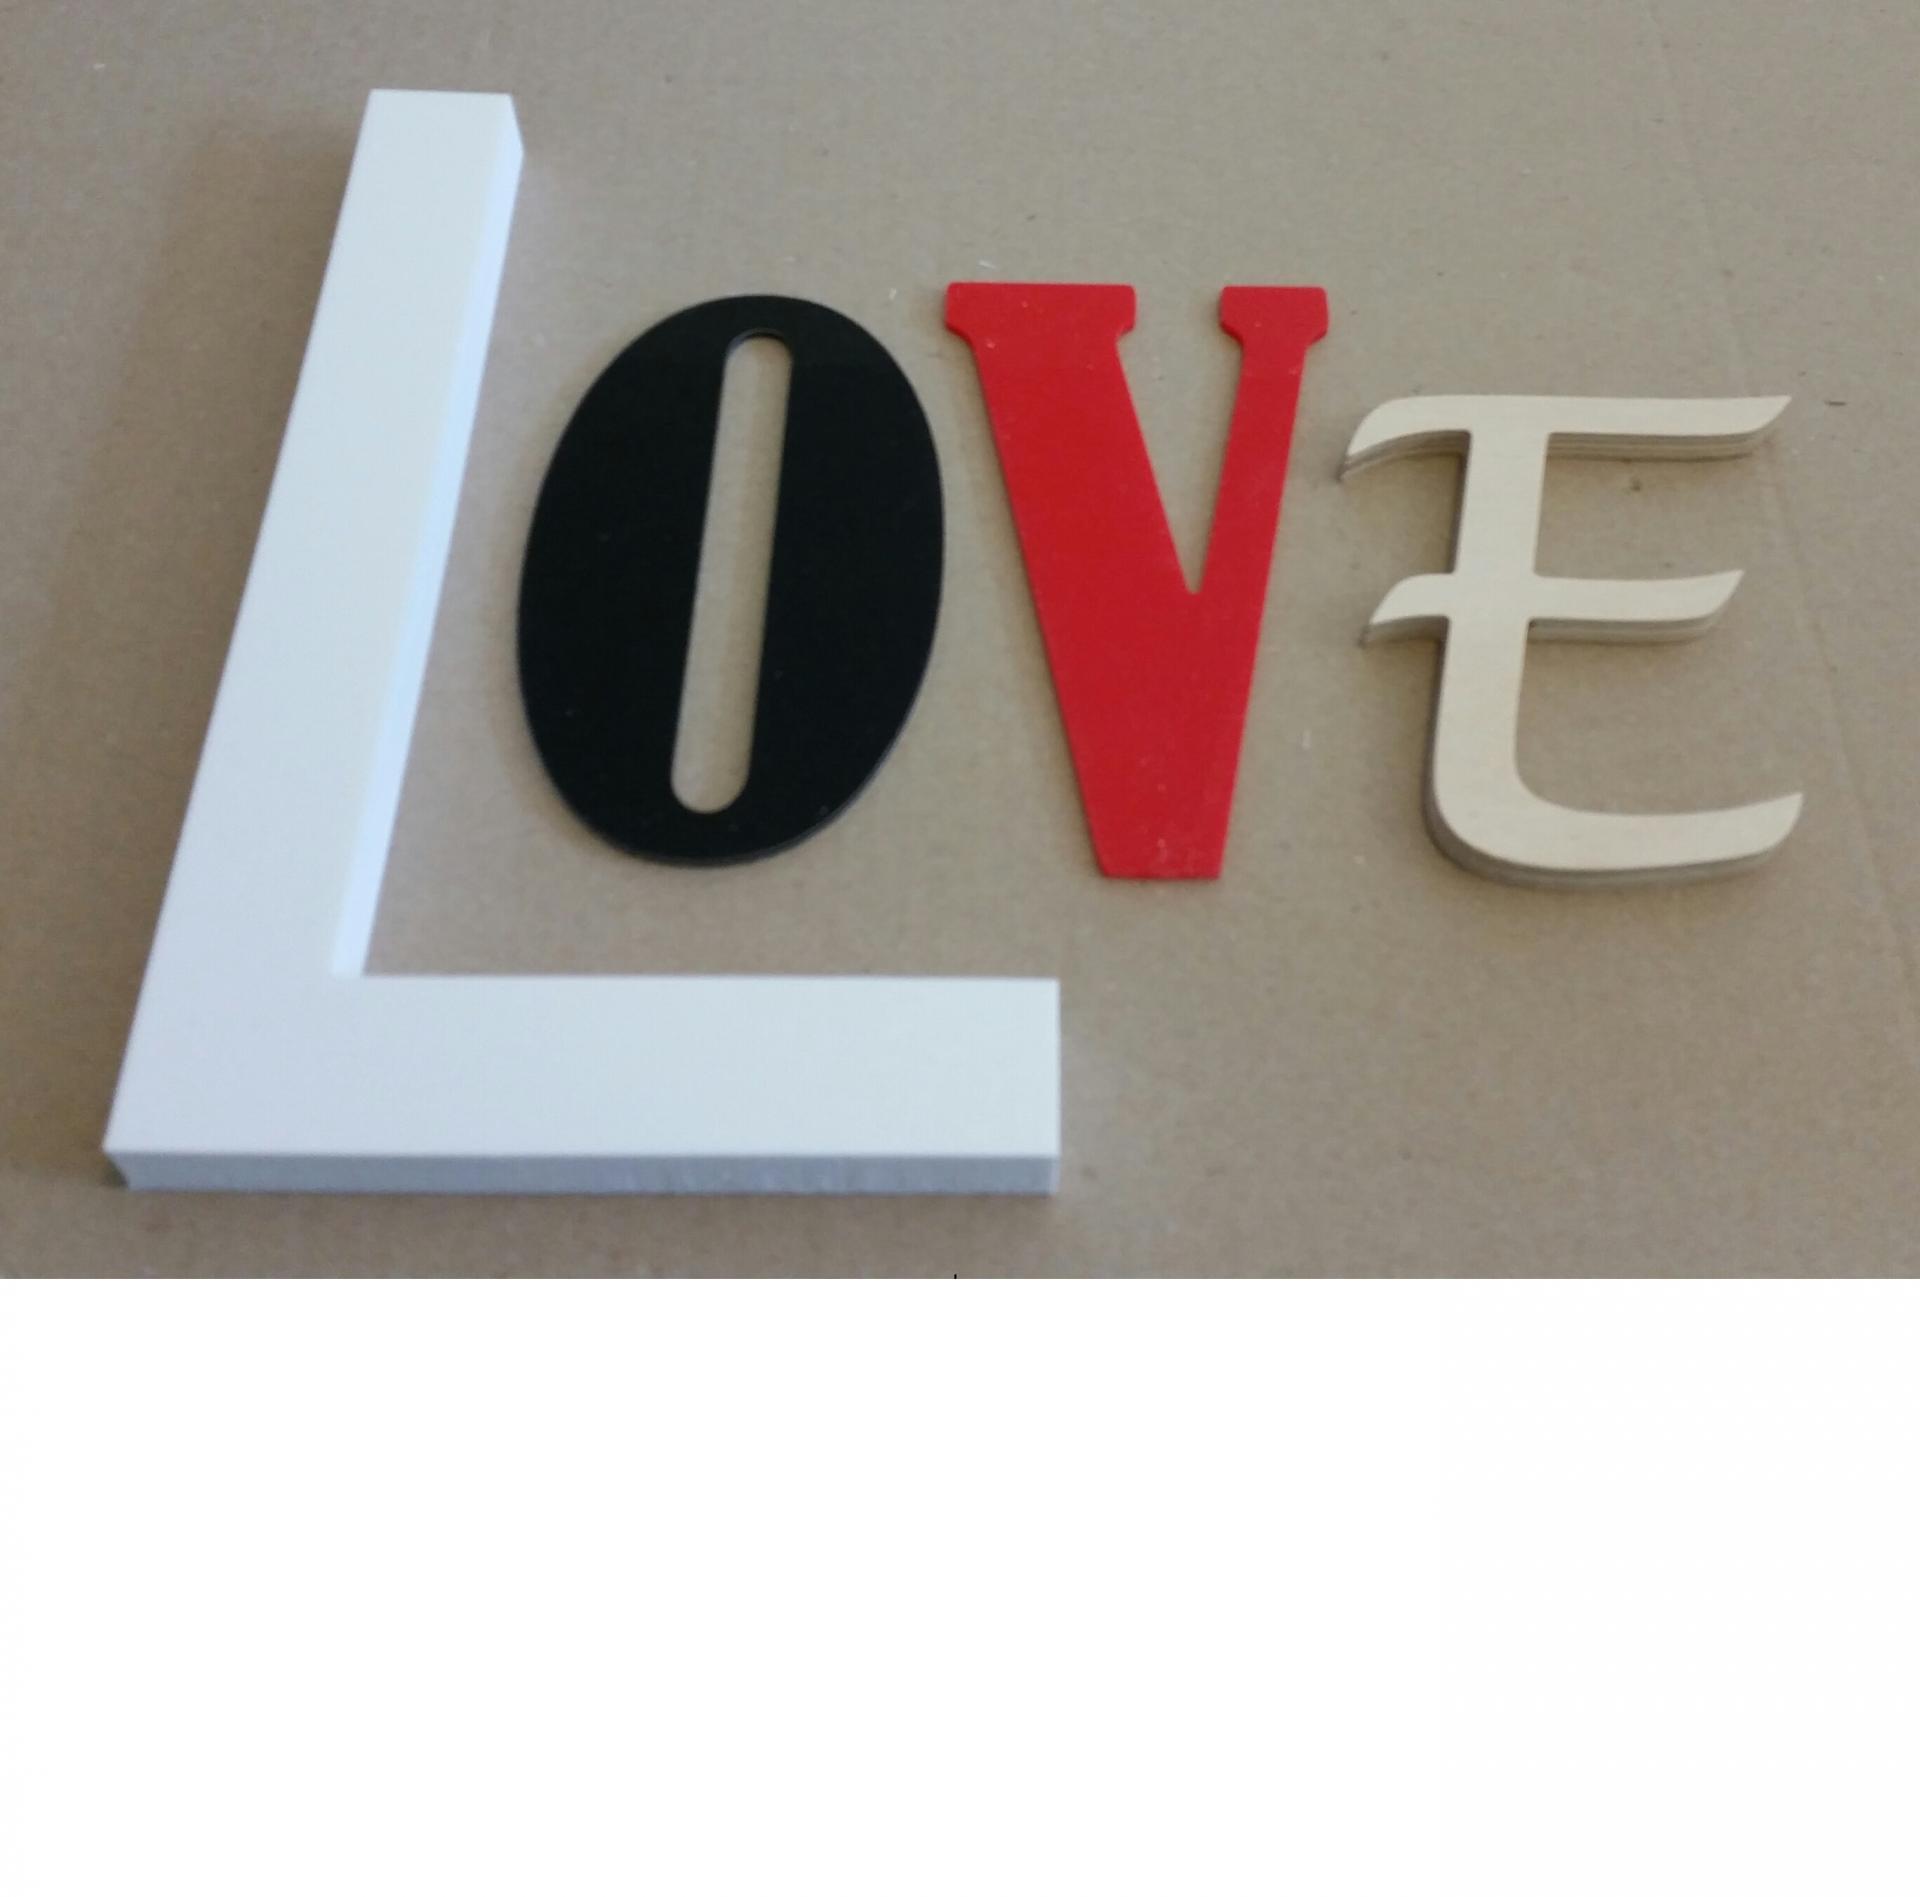 Lettre decorative love lot 0007